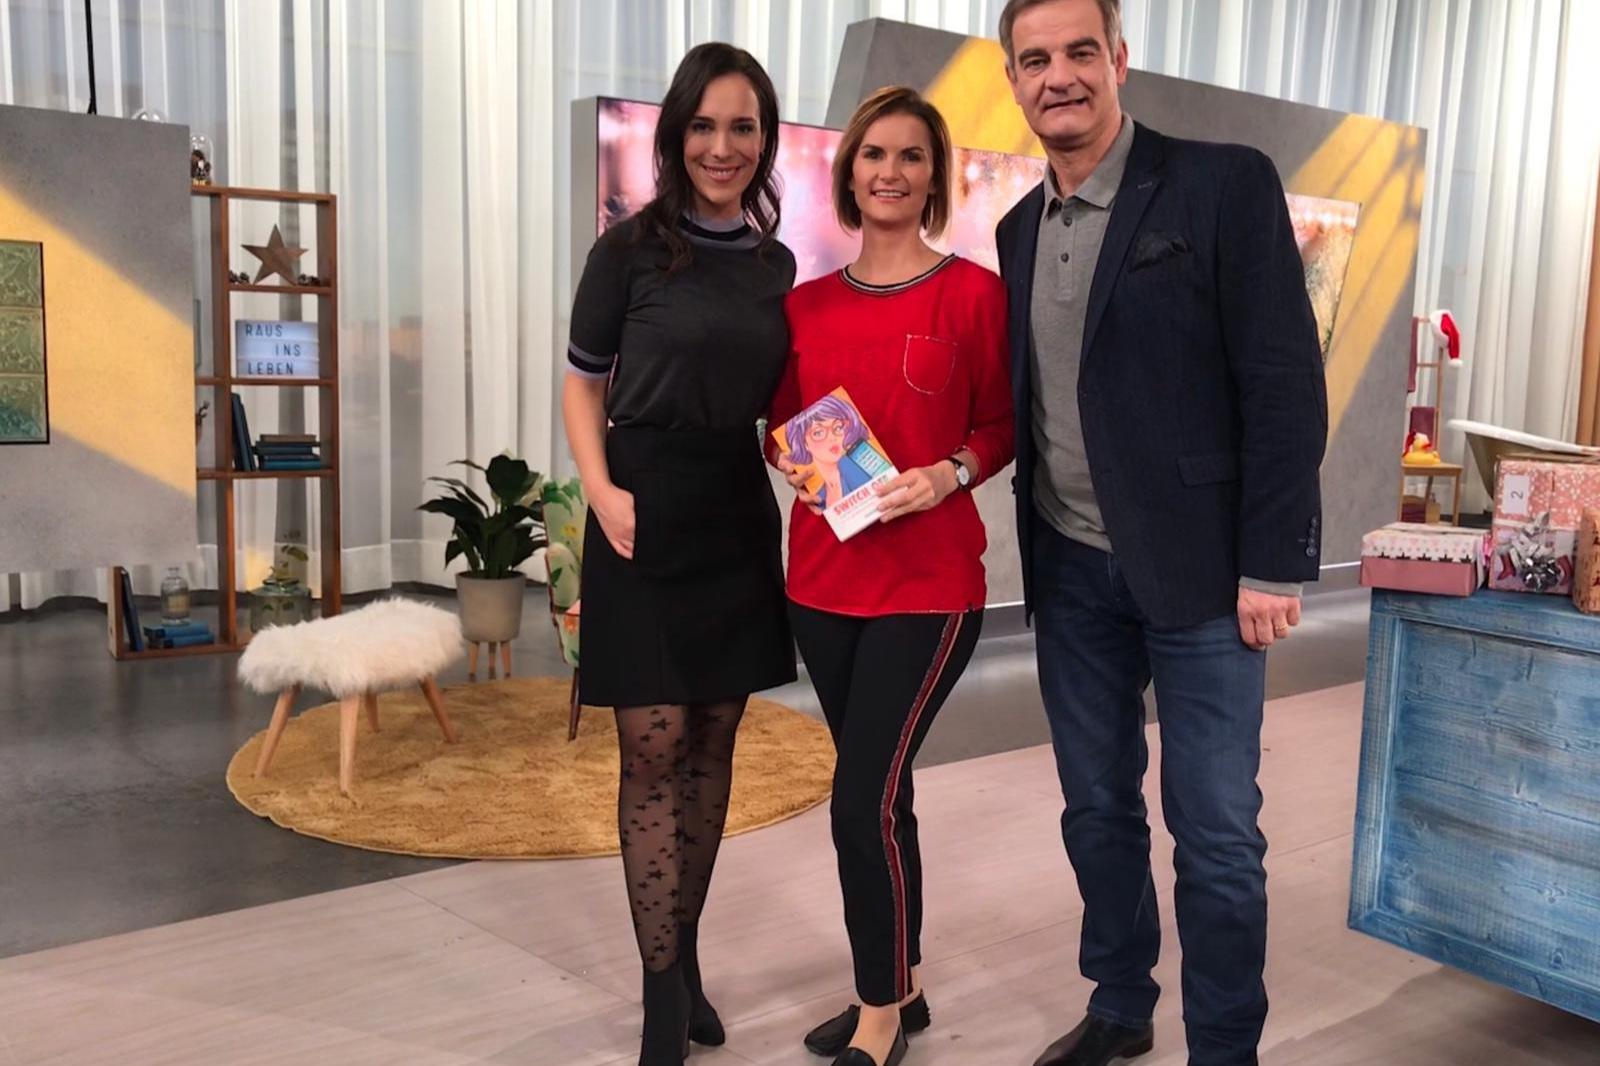 Live nach NeunDigital Detox Interview - 06. Dezember 2018 | Live nach Neun | Das Erste | WDRZum Beitrag